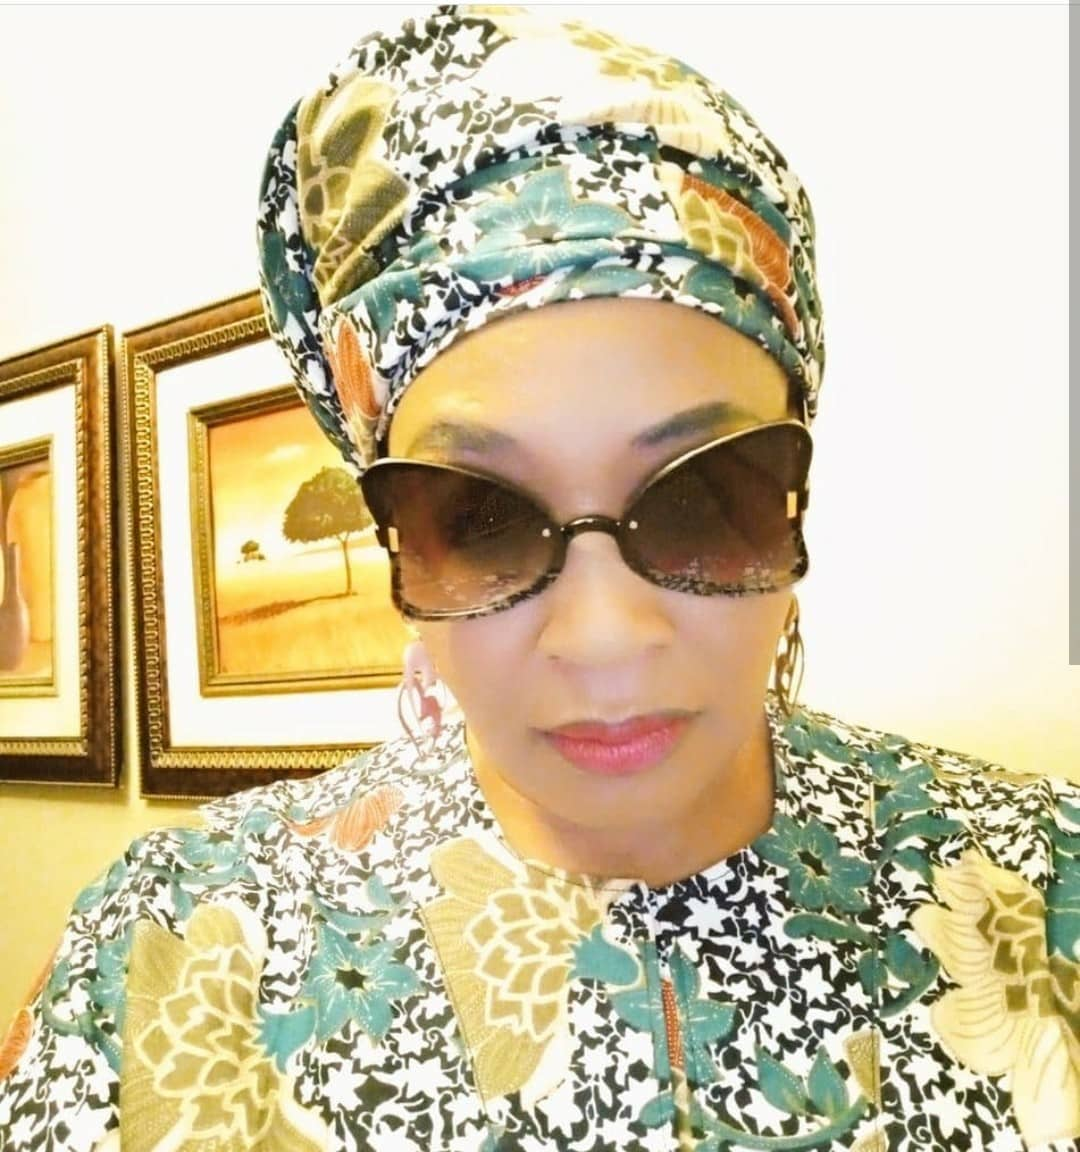 Chioma's engagement ring to Davido has been taken away - Kemi Olunloyo